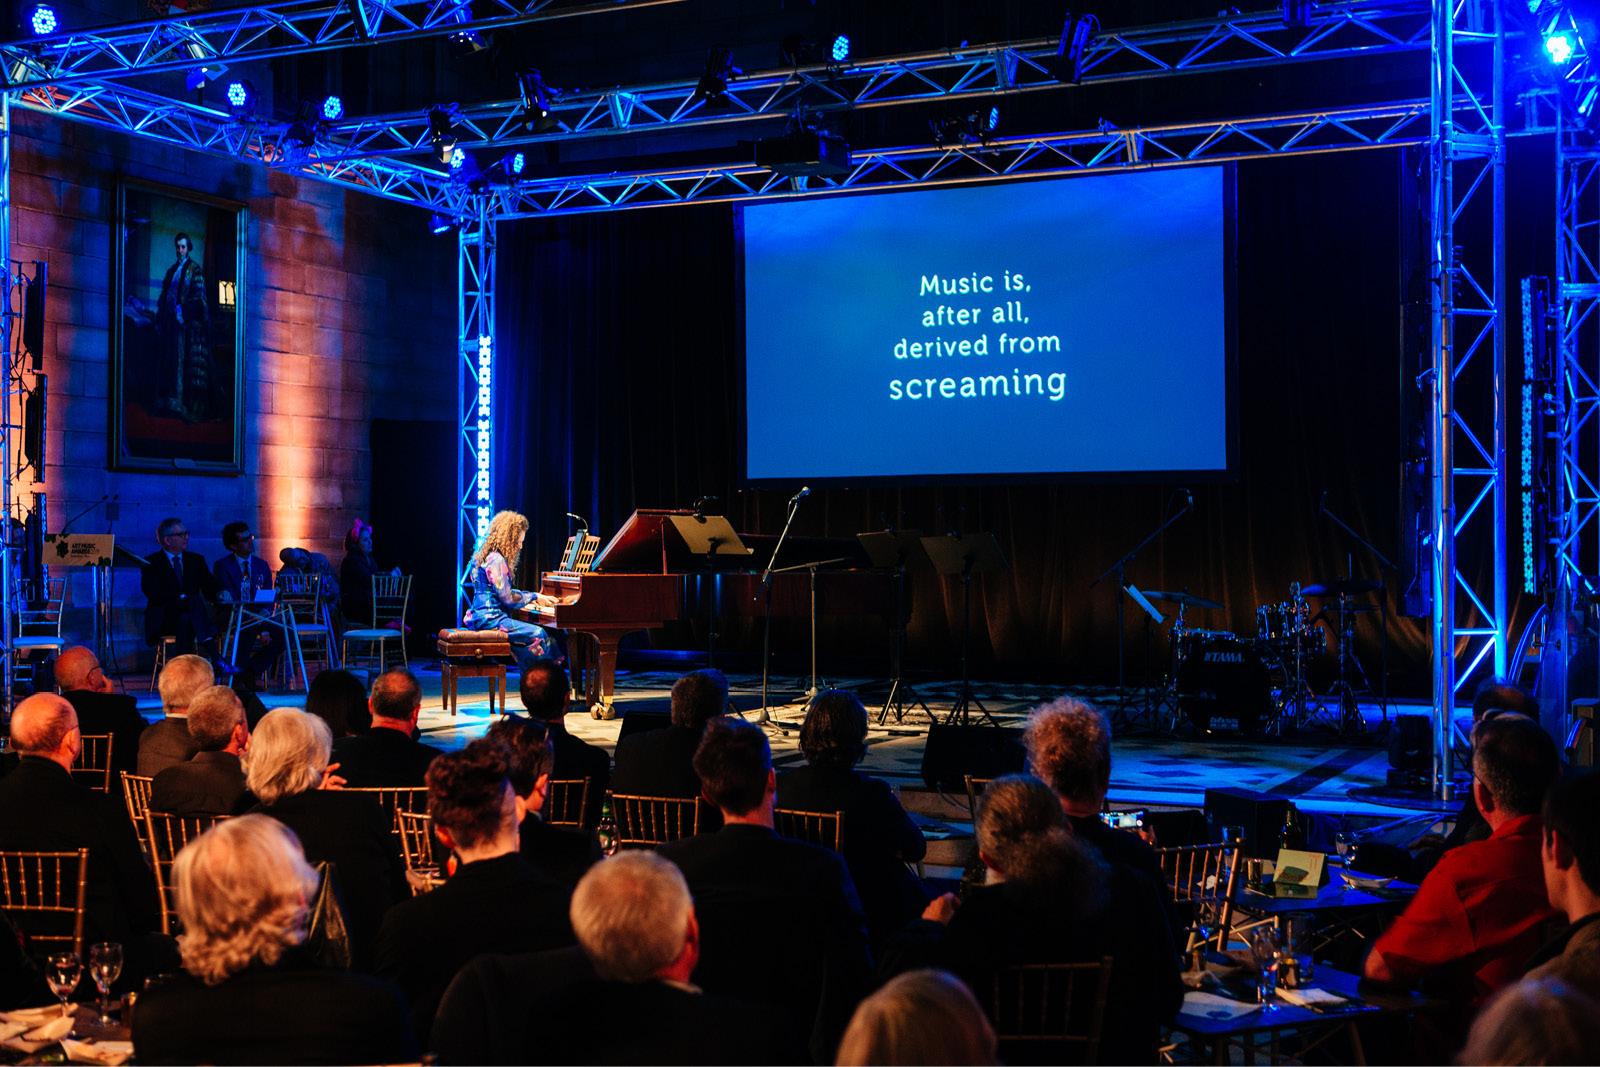 Sonya Lifschitz at the Art Music Awards